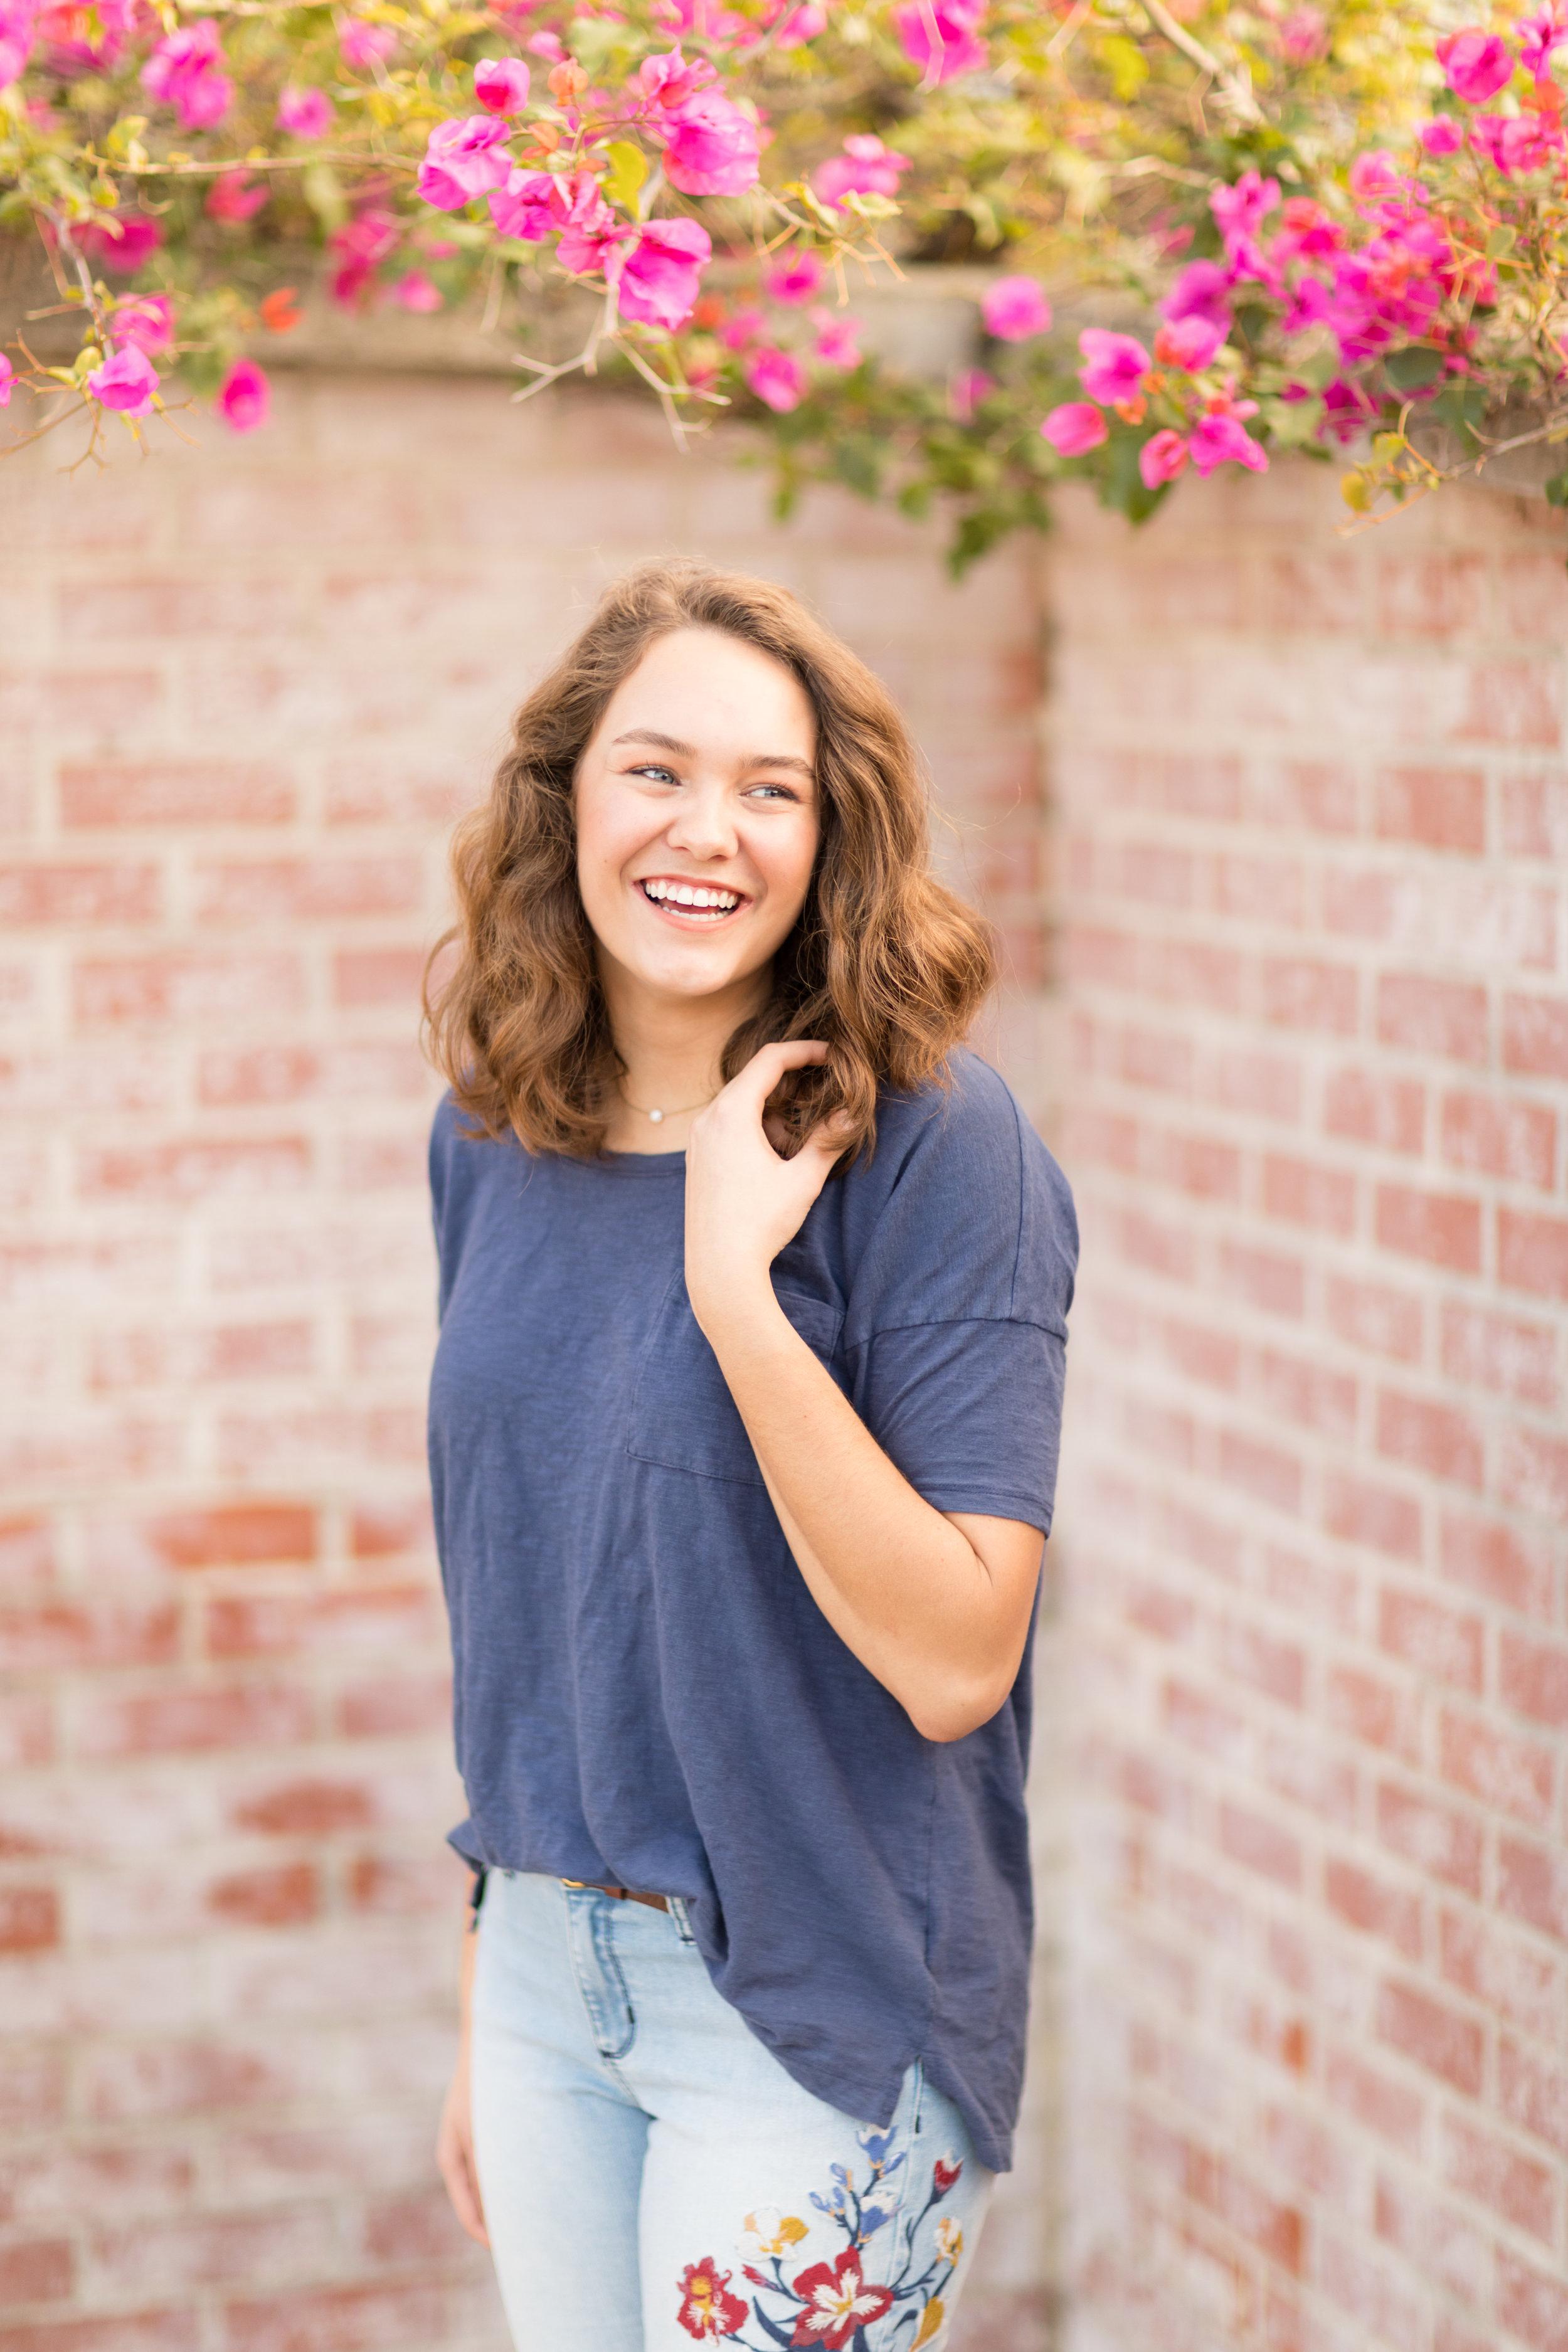 palos verdes senior portraits